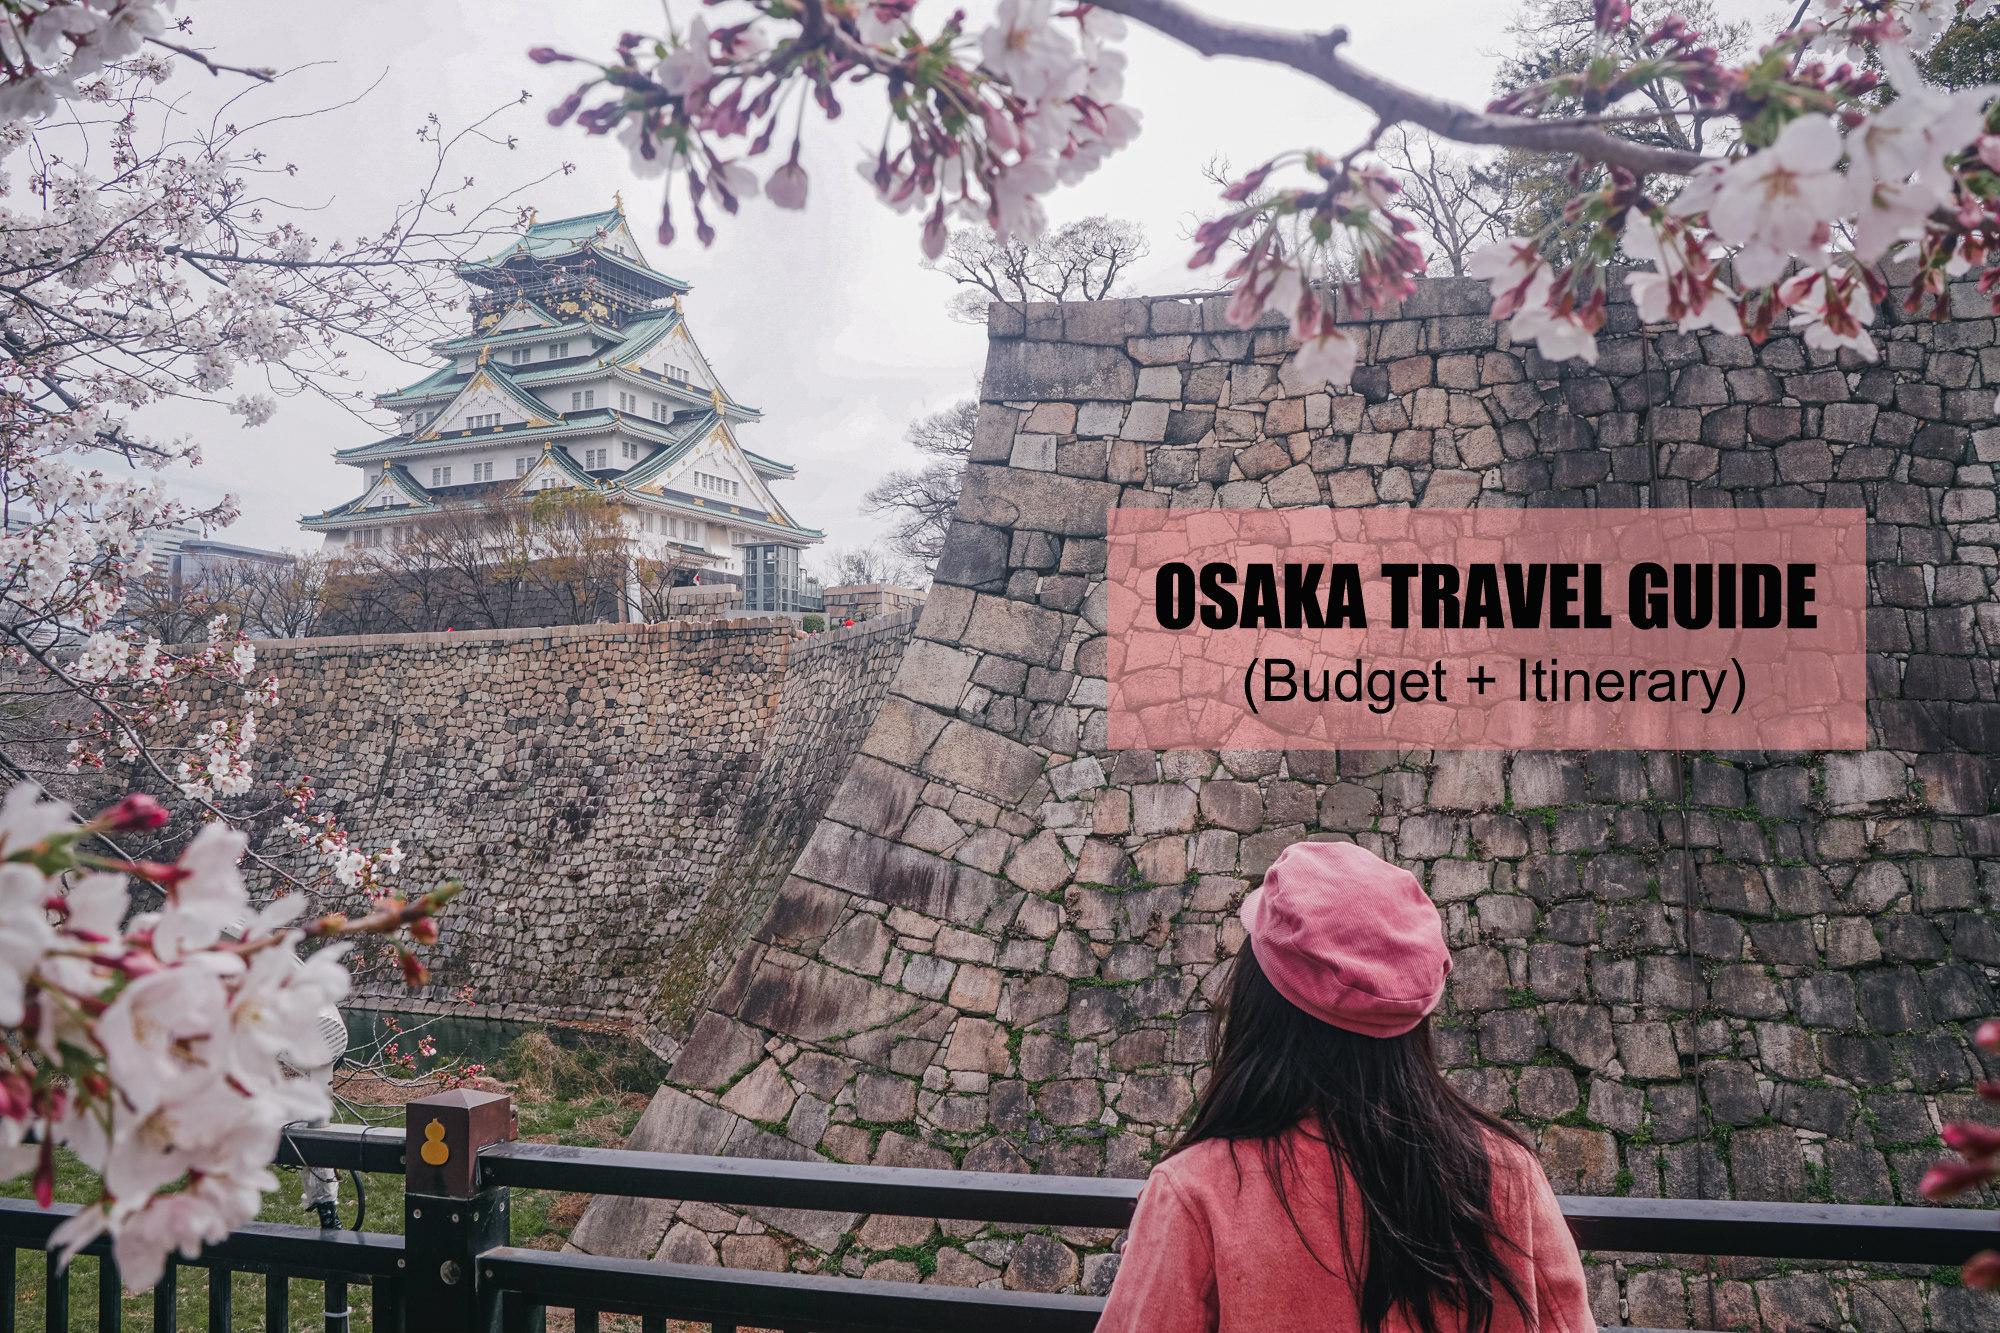 Osaka Subway Map T Shirt.Osaka Travel Guide 2019 Budget Itinerary The Pinay Solo